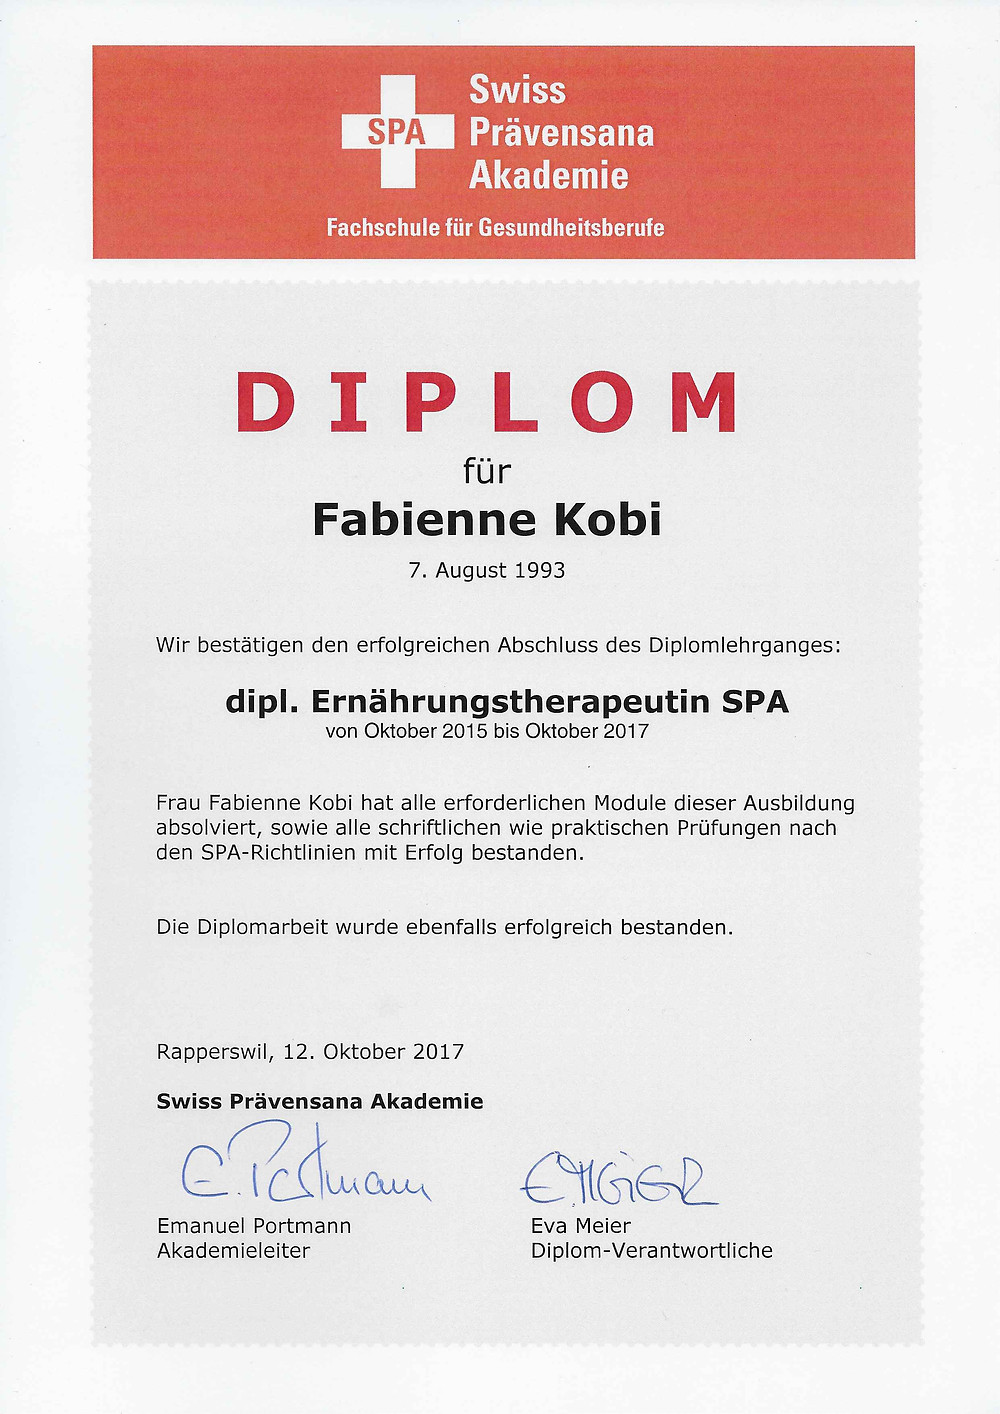 Ernährungsberatung, Ernährungstherape und Fitnessberatung in Lyss, Fabienne Kobi, Diplom, dipl. Ernährungstherapeutin SPA